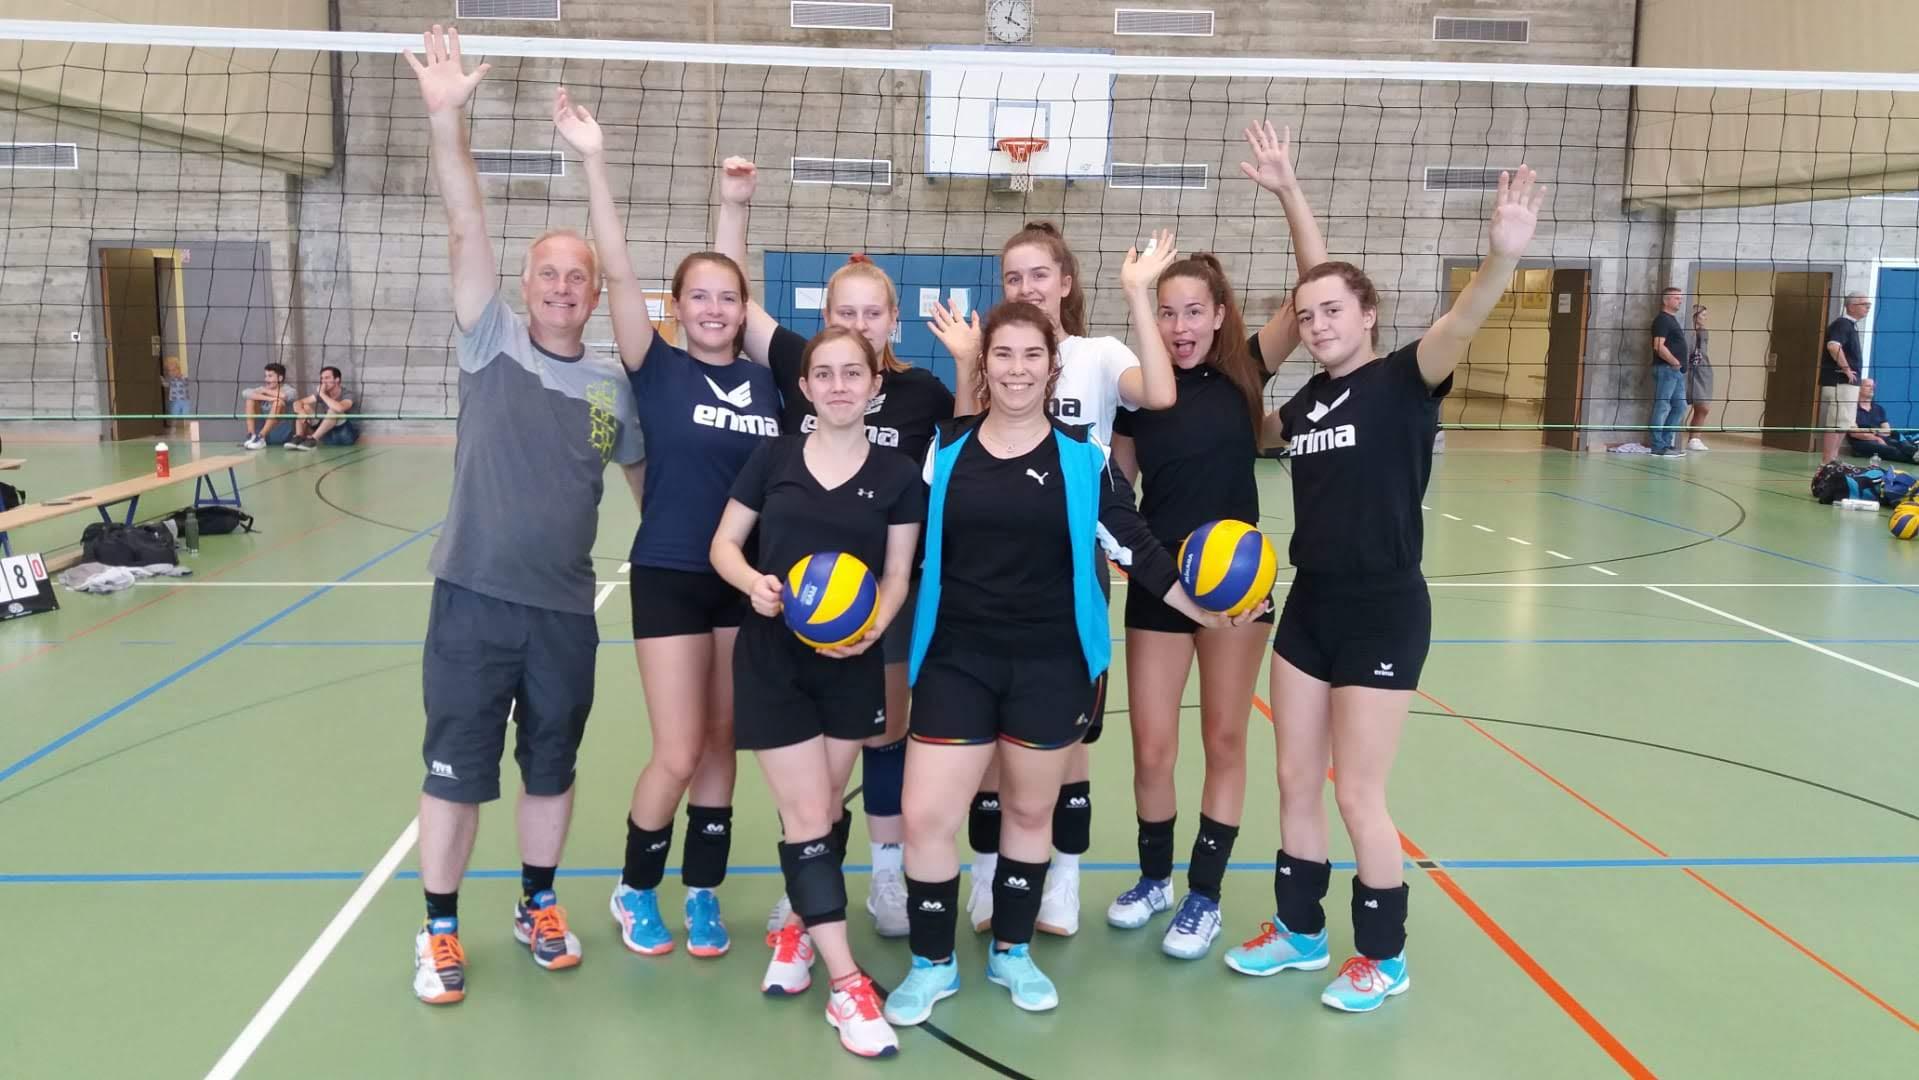 Turnier Lostorf 2019 Juniorinnen